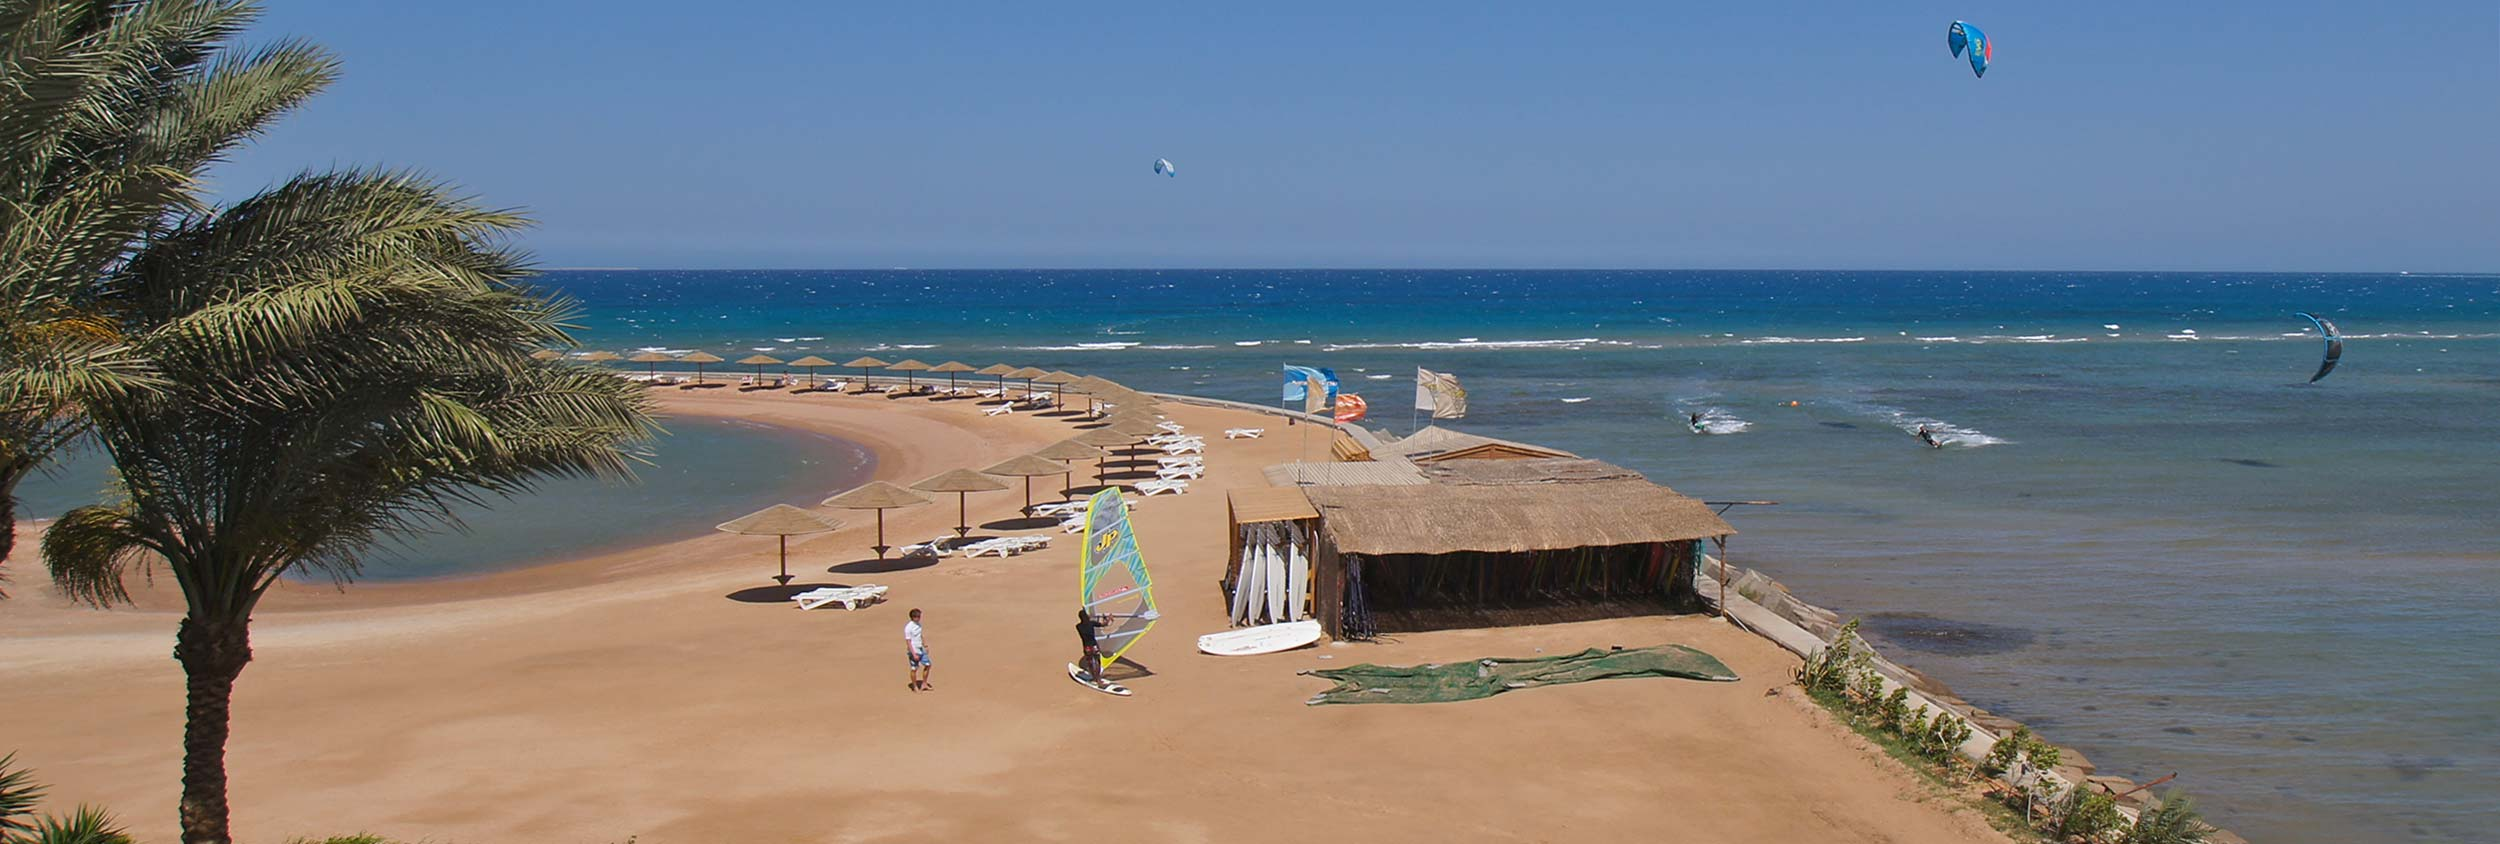 Hurghada Egypt Kiteworld travel